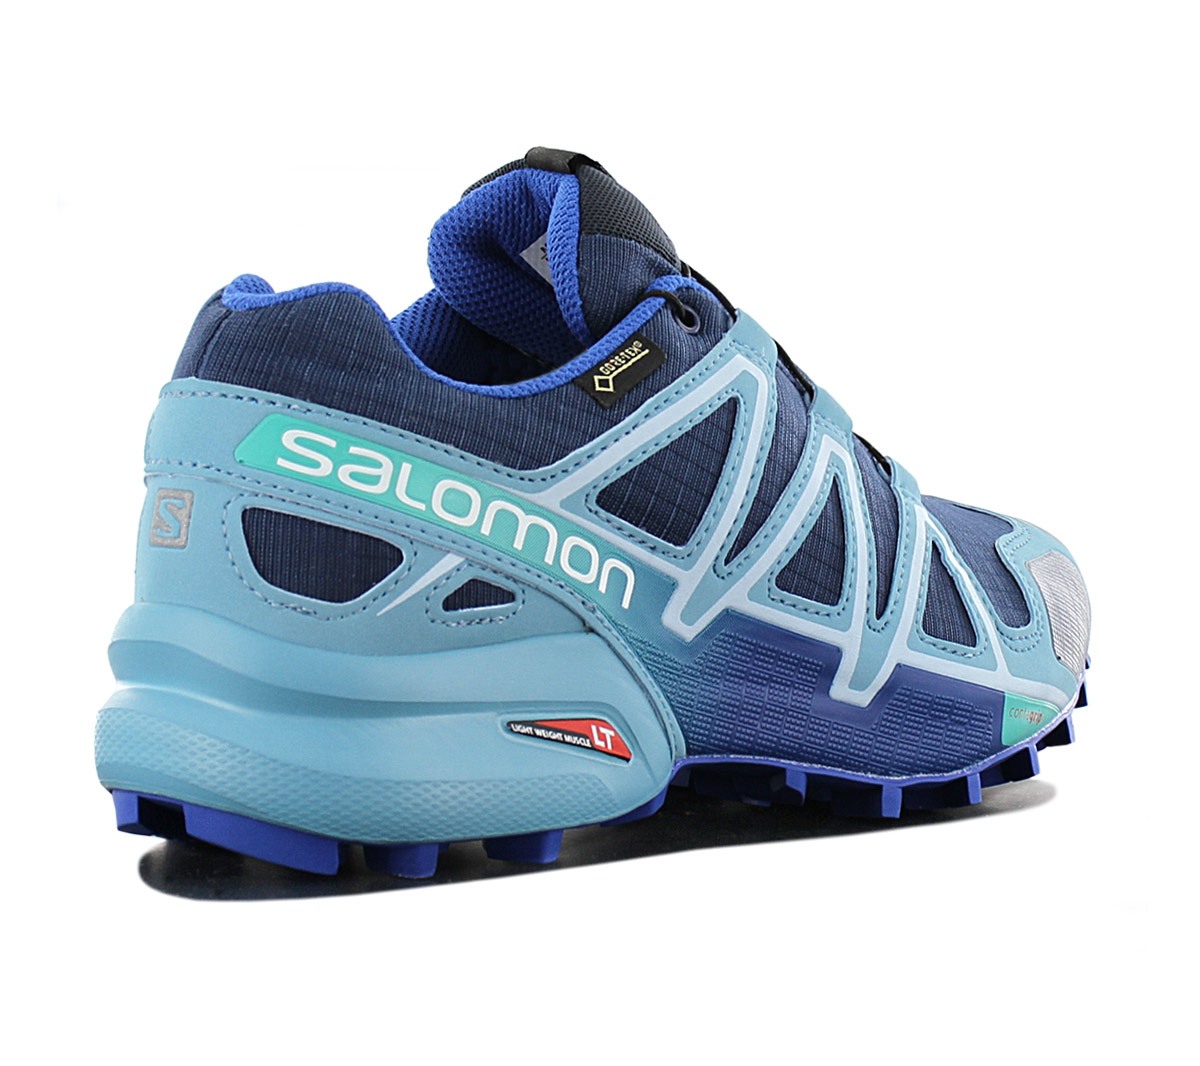 salomon speedcross 4 gtx weight espa�ol original